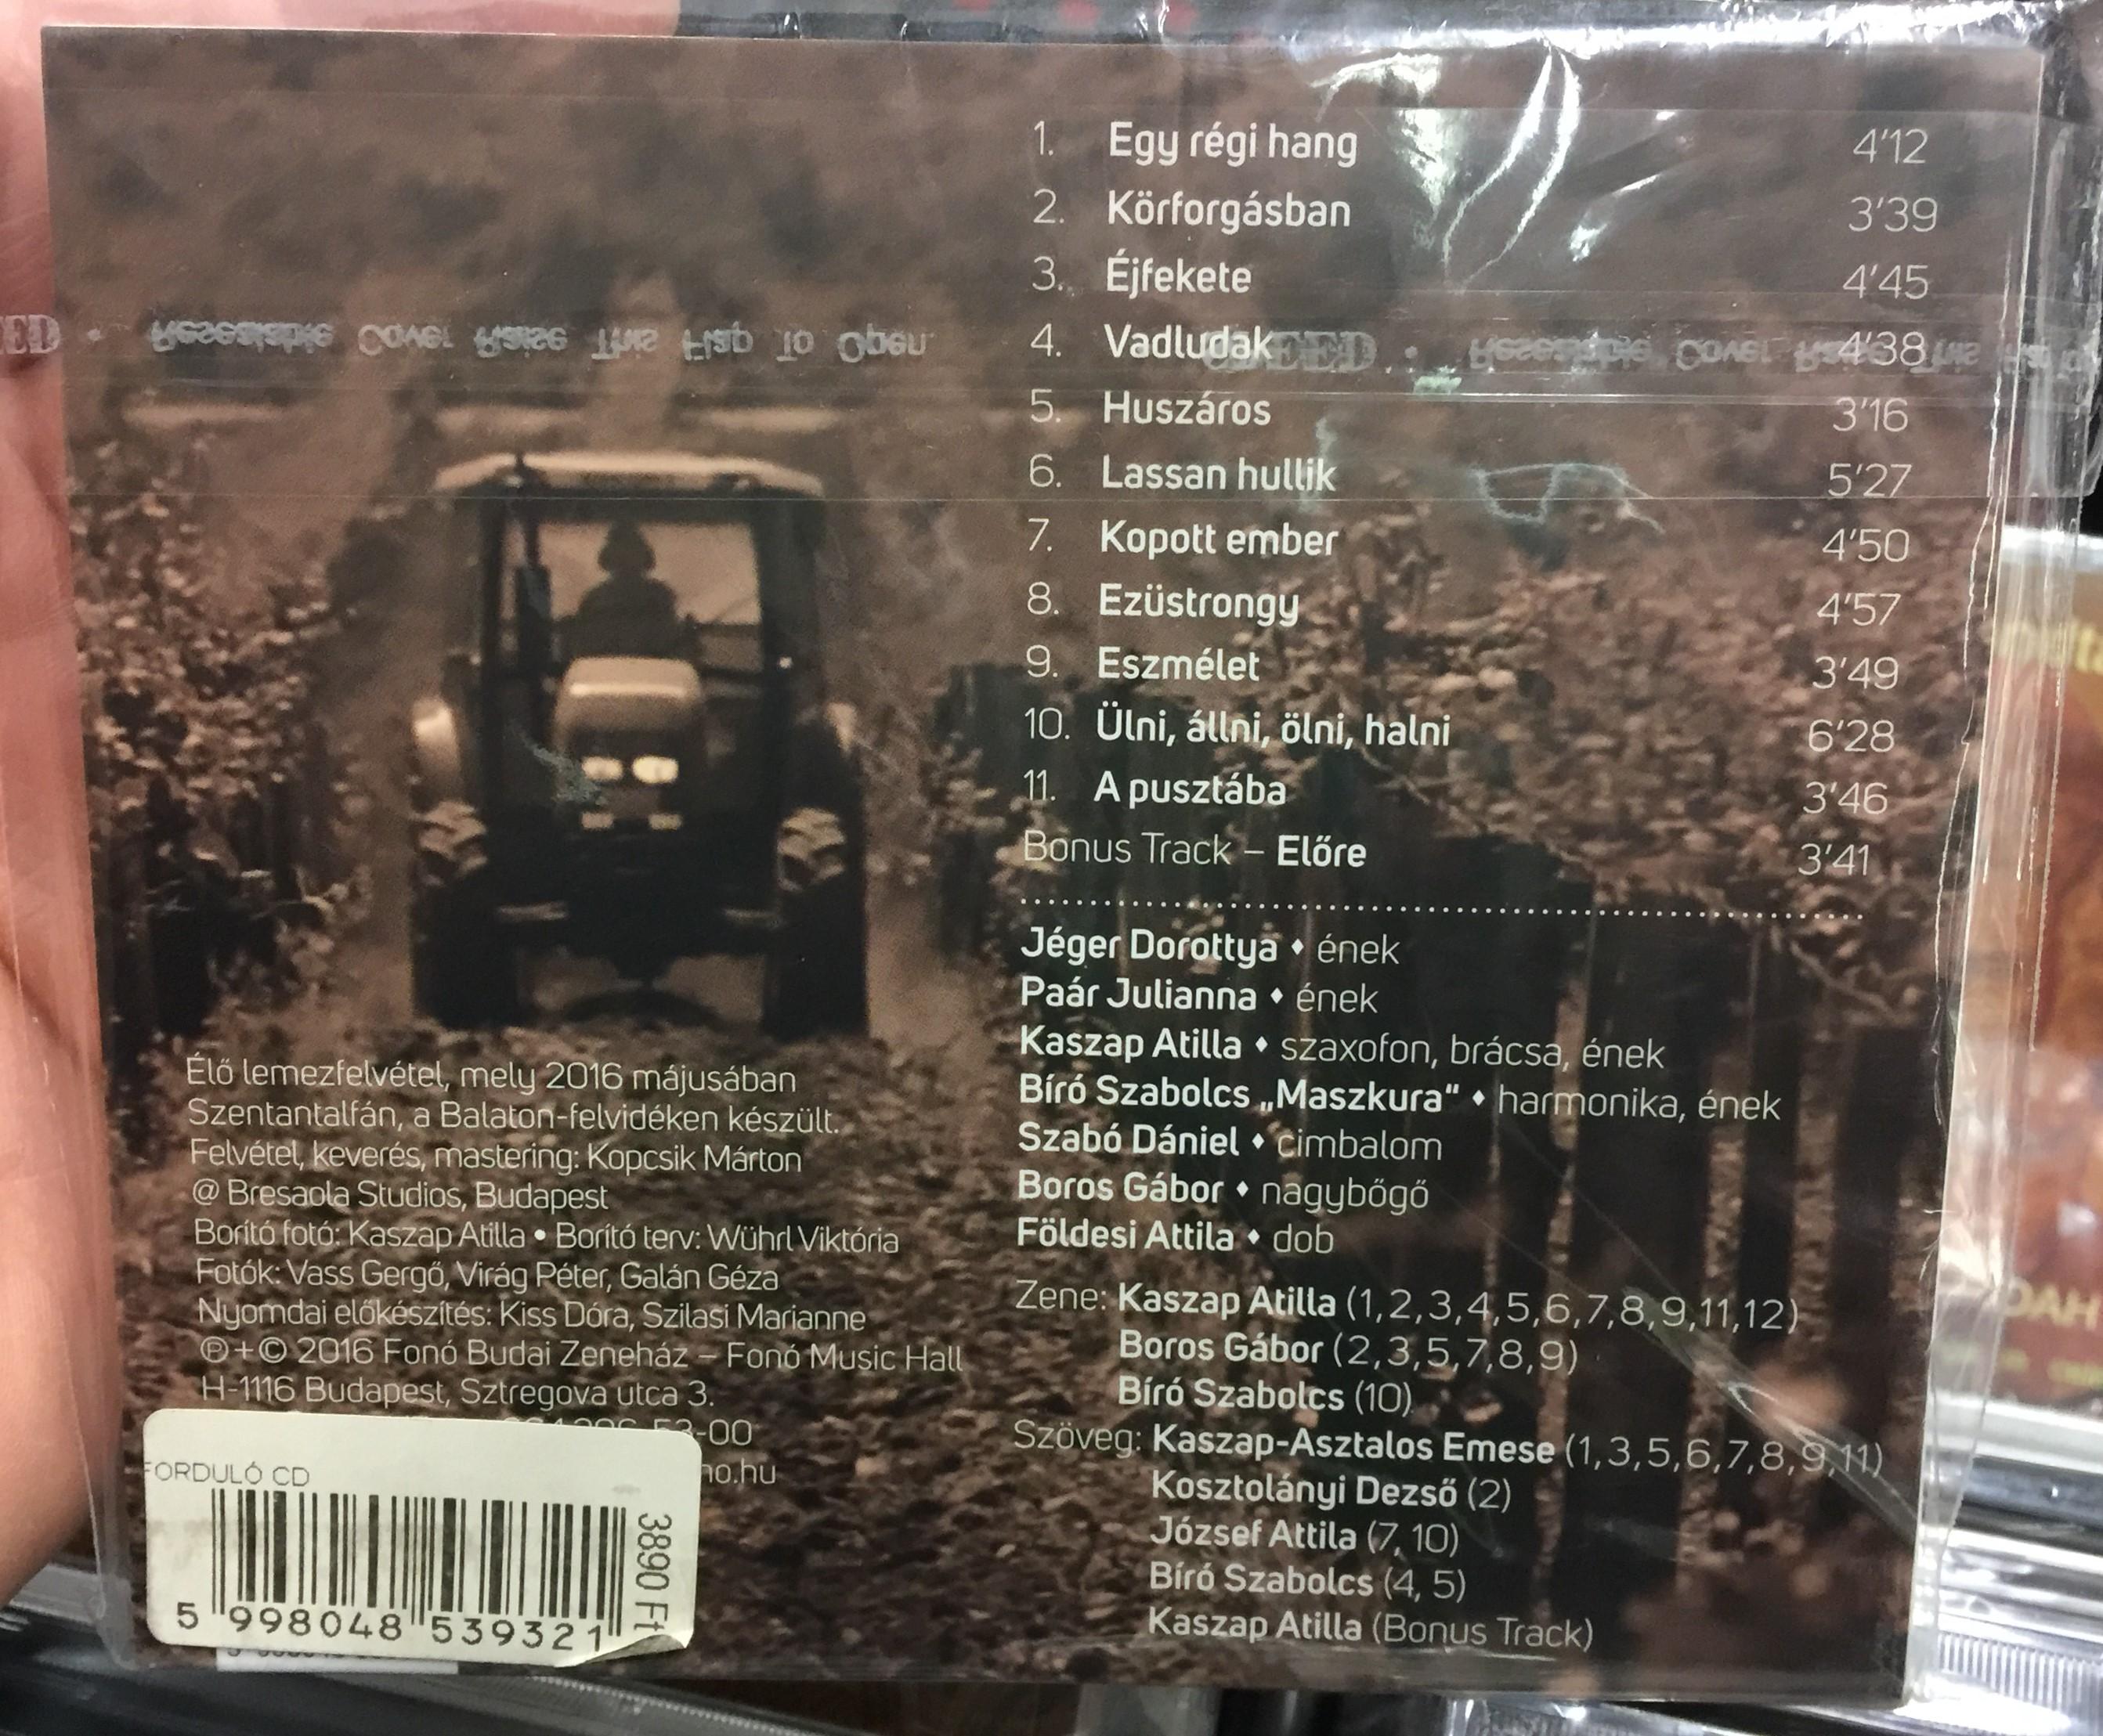 nana-vortex-fordulo-fon-budai-zeneh-z-audio-cd-2016-5998048539321-2-.jpg